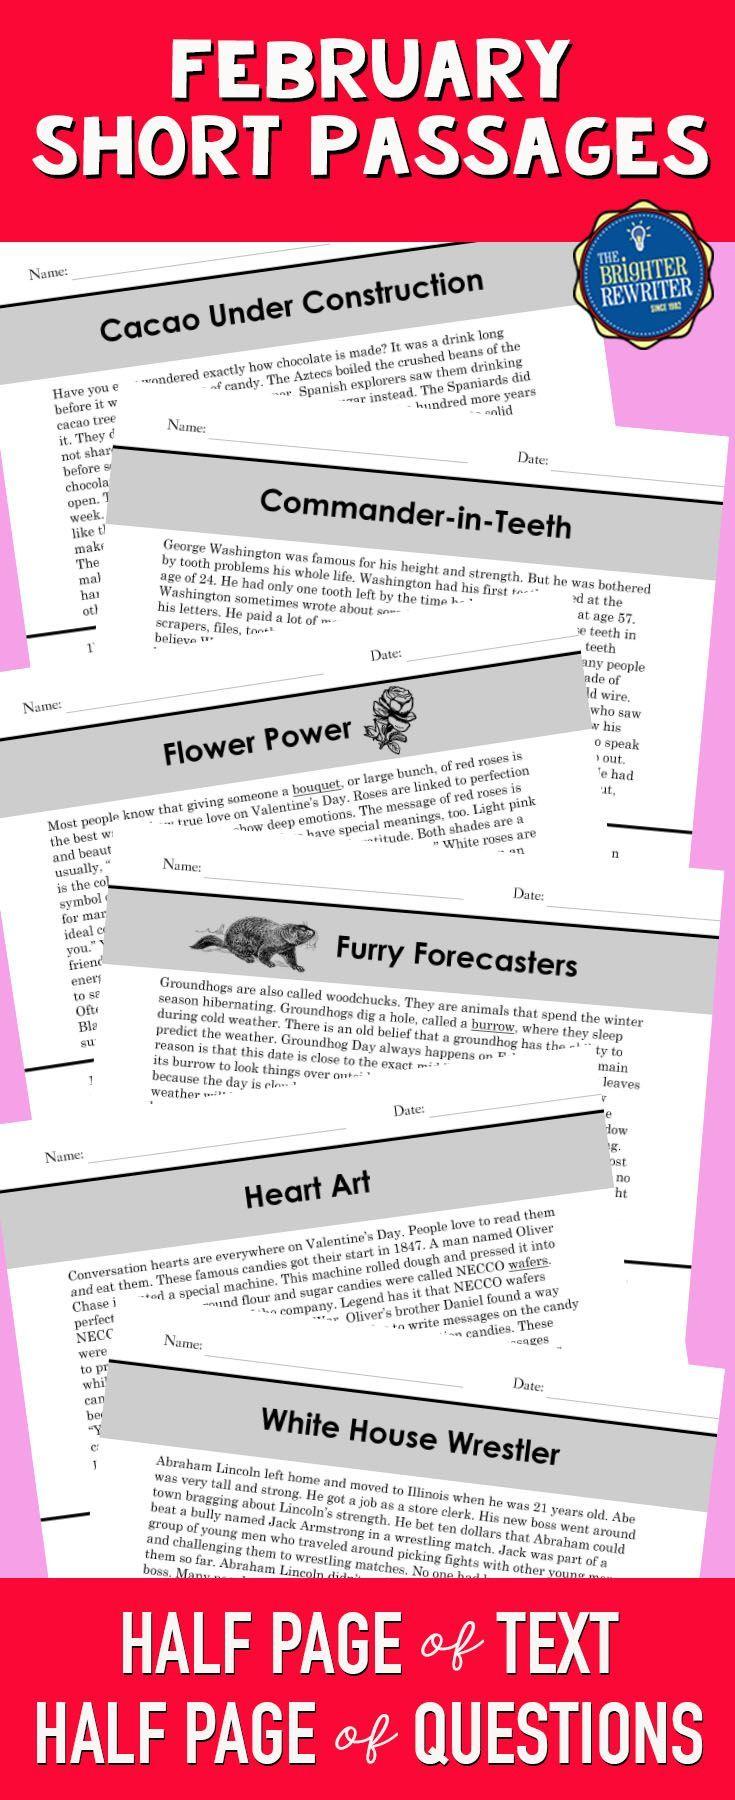 Valentines Day Reading Comprehension Passages Black History Reading Reading Comprehension Passages Nonfiction Reading Passages [ 1800 x 735 Pixel ]